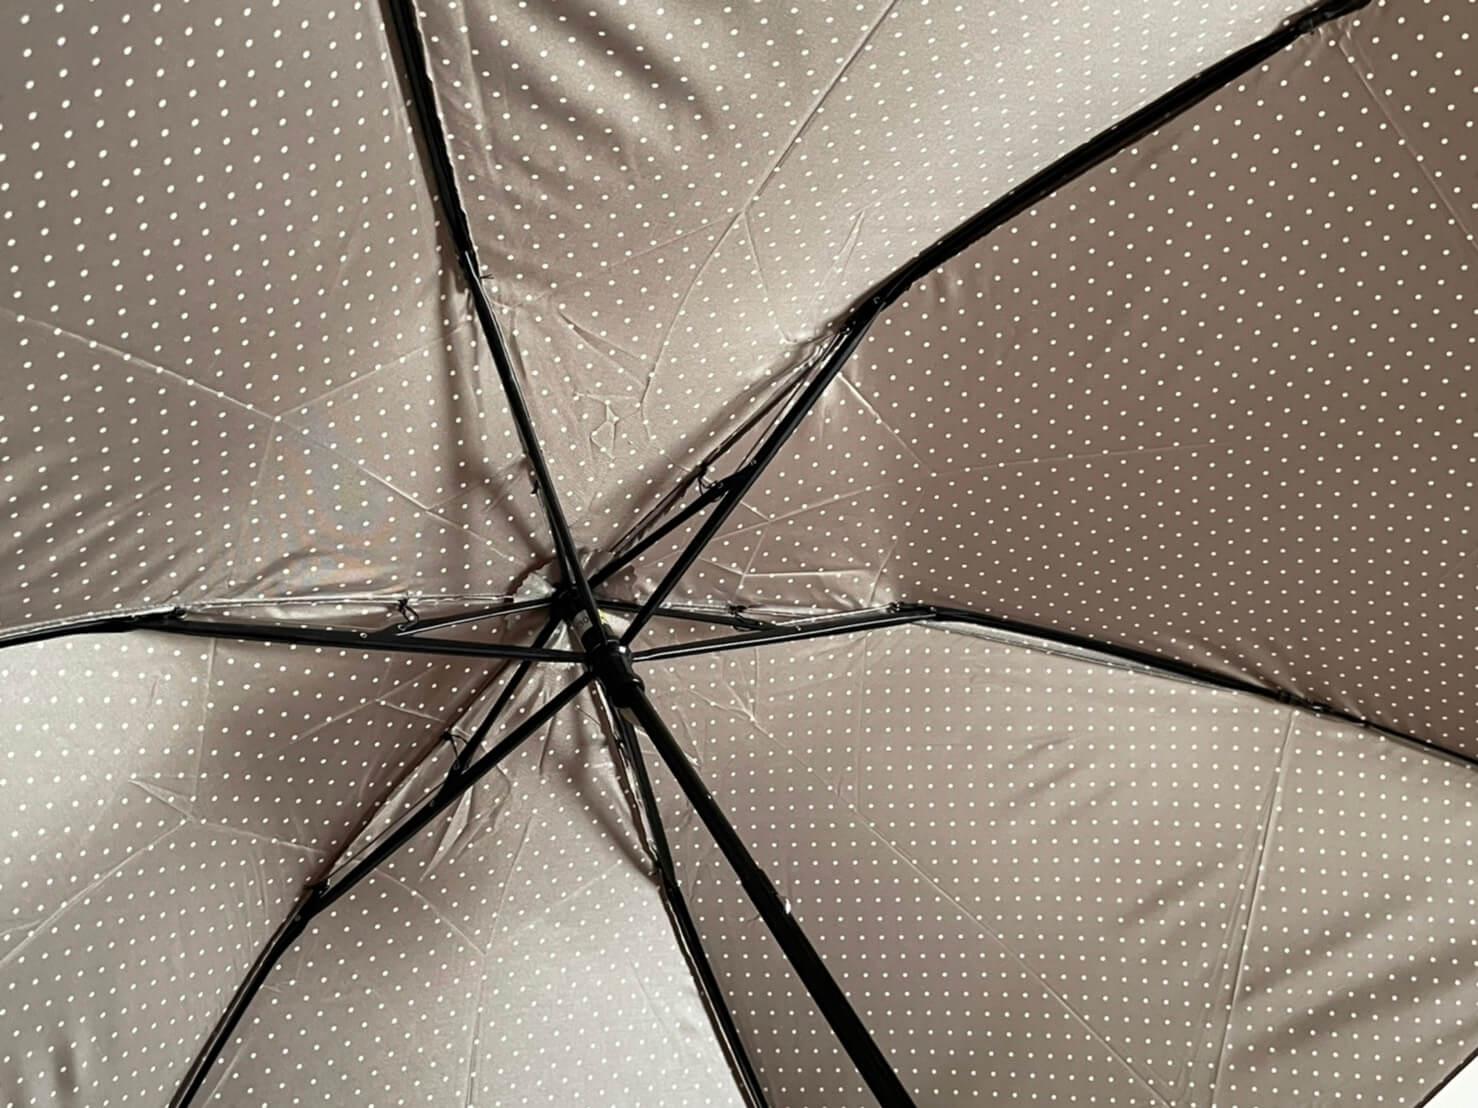 Japanese Made folding umbrella 日本製のシンプルな折り畳み傘